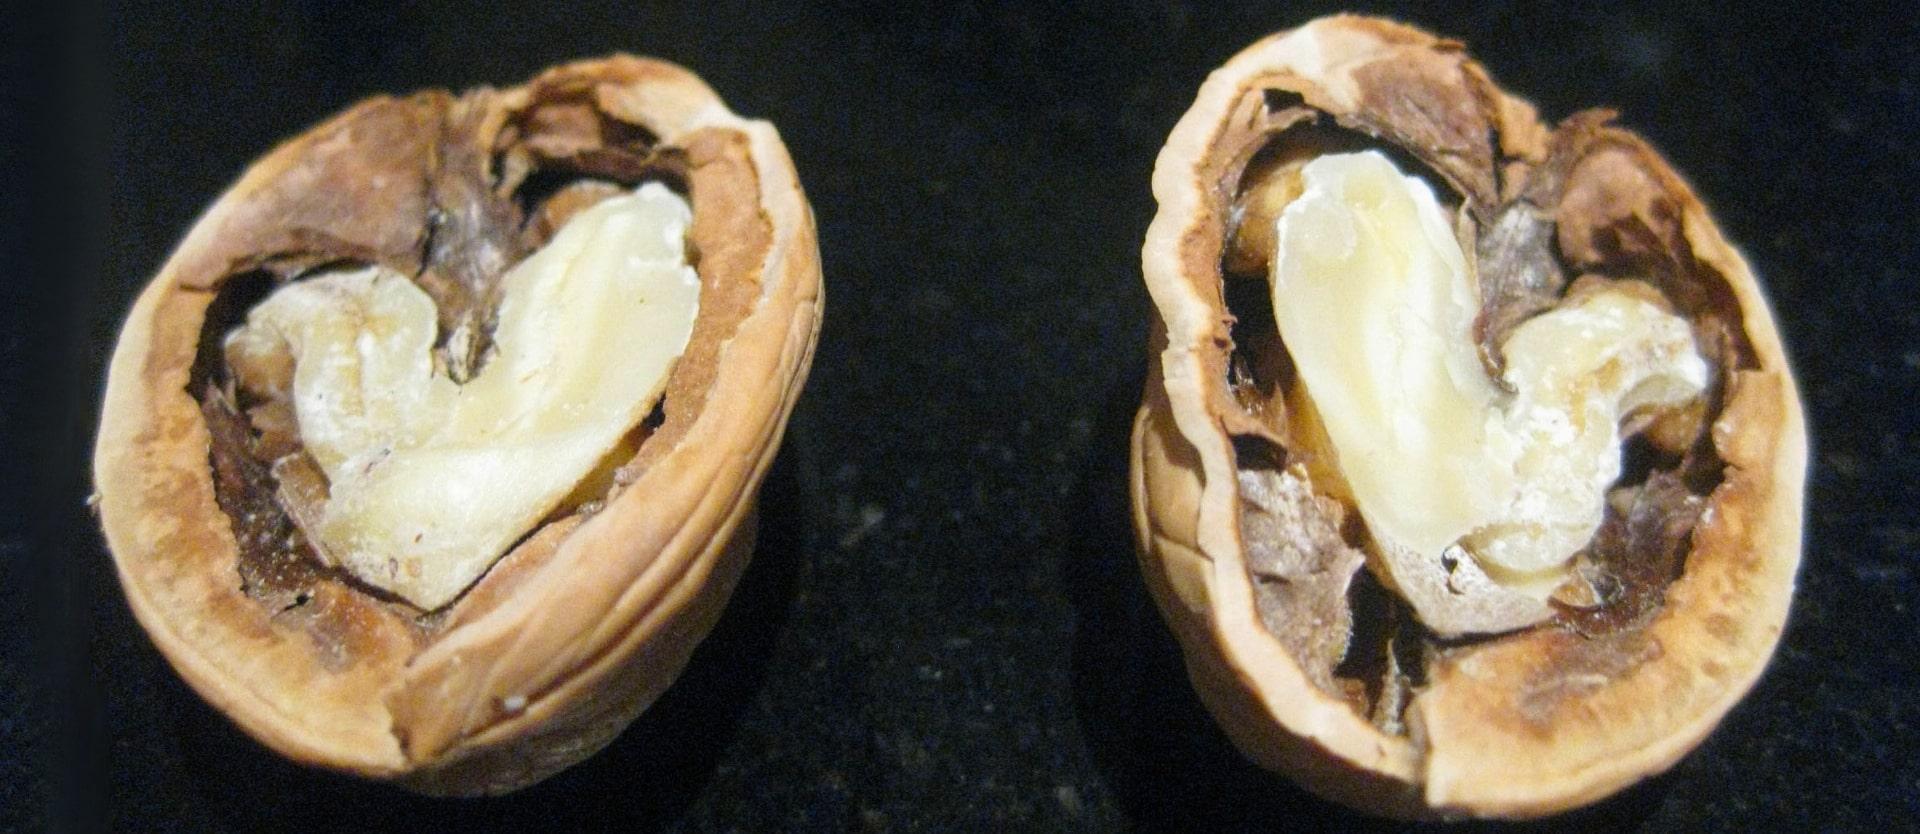 Walnuts and Arterial Funciton